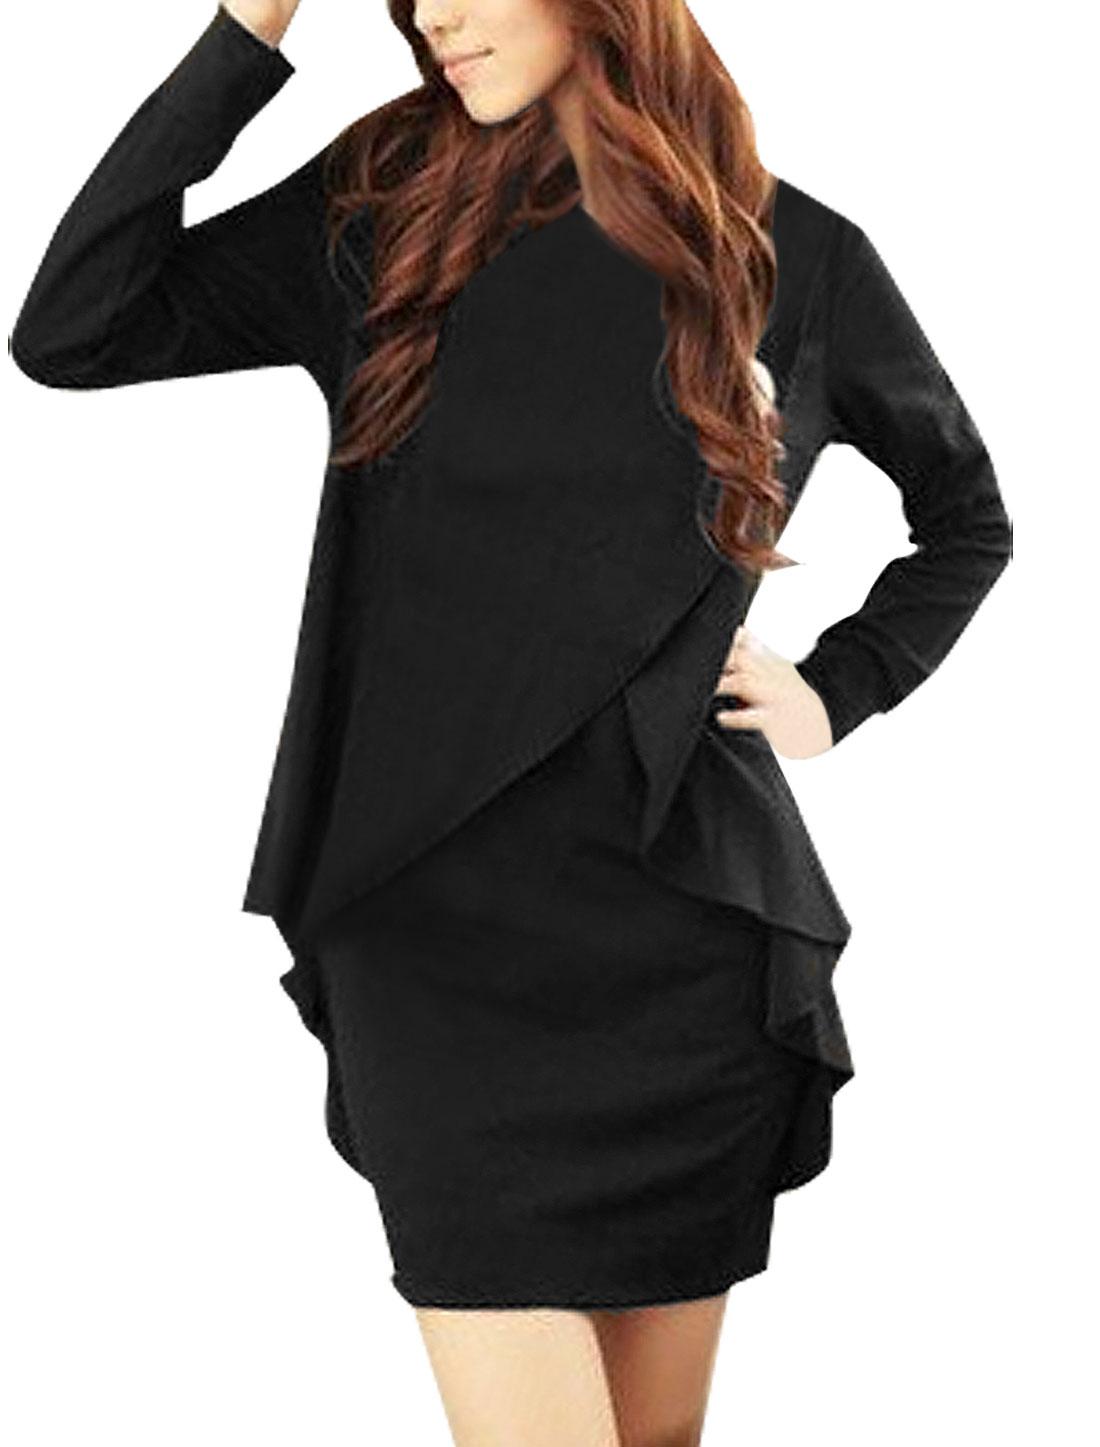 Women Black Long Sleeve Stretchy Autumn Tunic Shirt XS